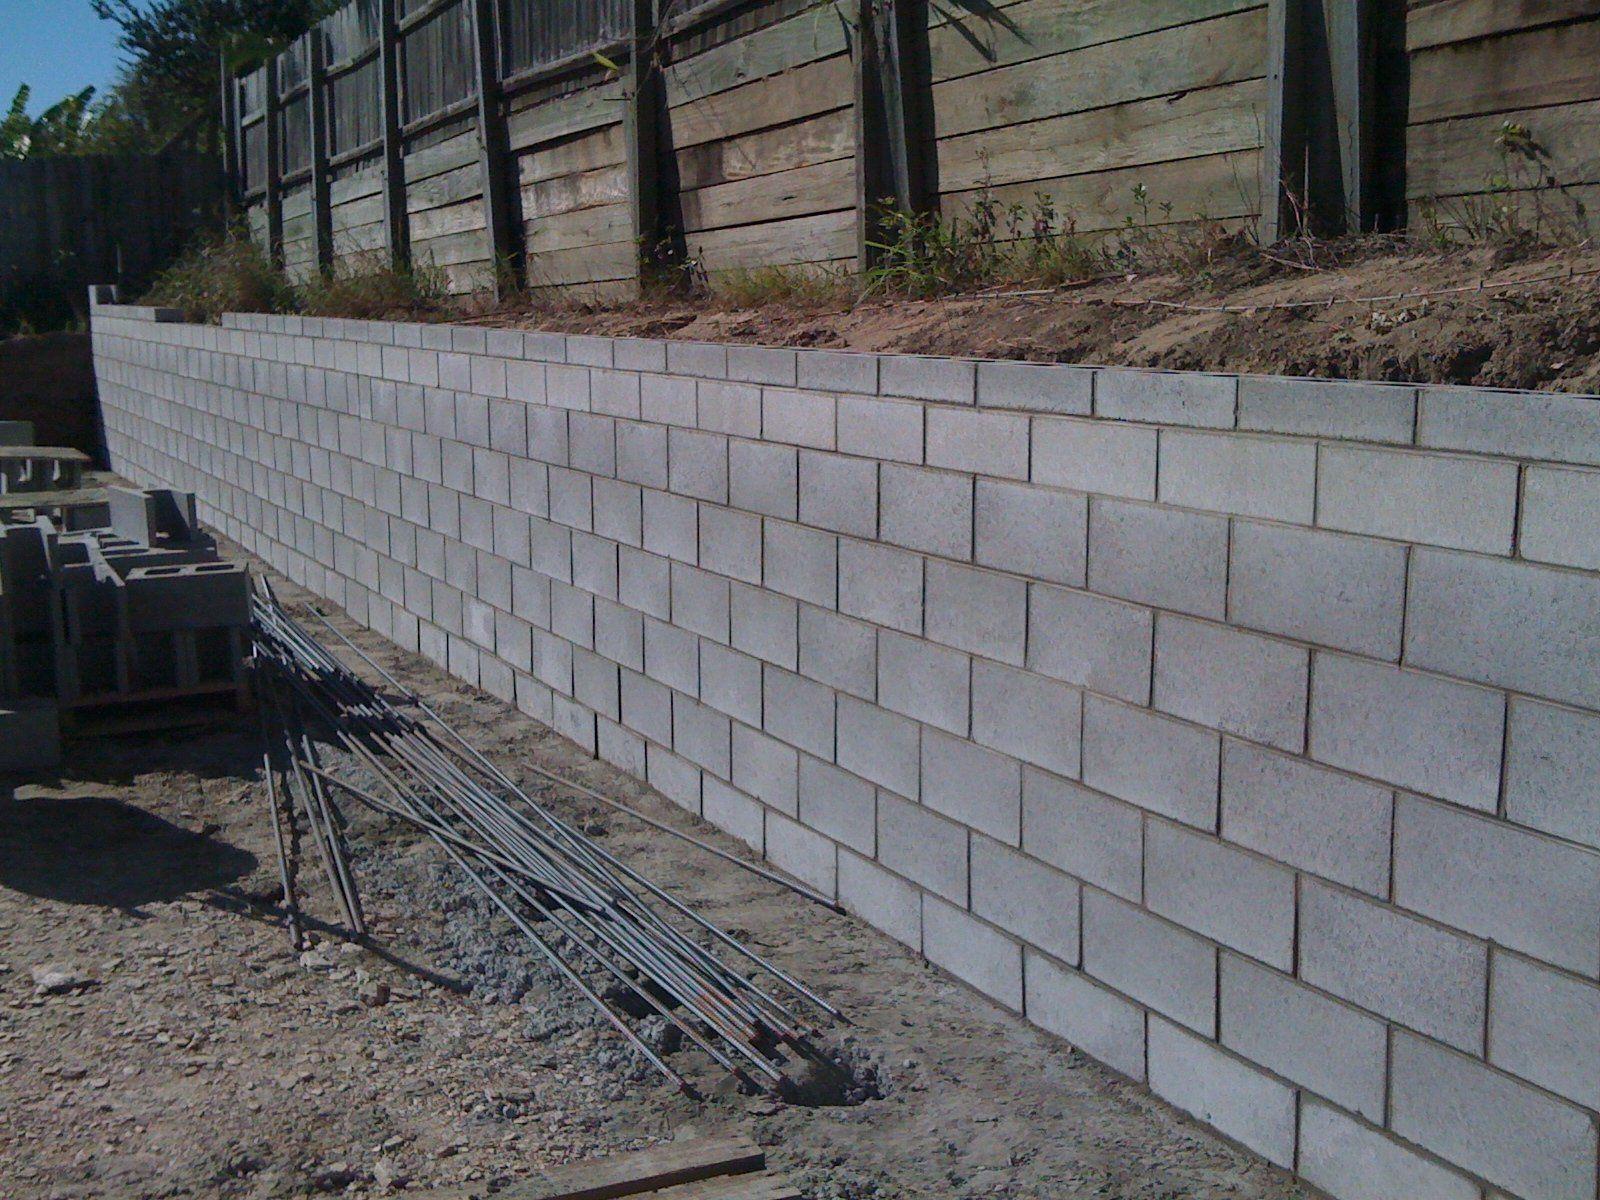 Retaining Wall Blocks In 2020 Retaining Wall Design Concrete Block Retaining Wall Cheap Retaining Wall